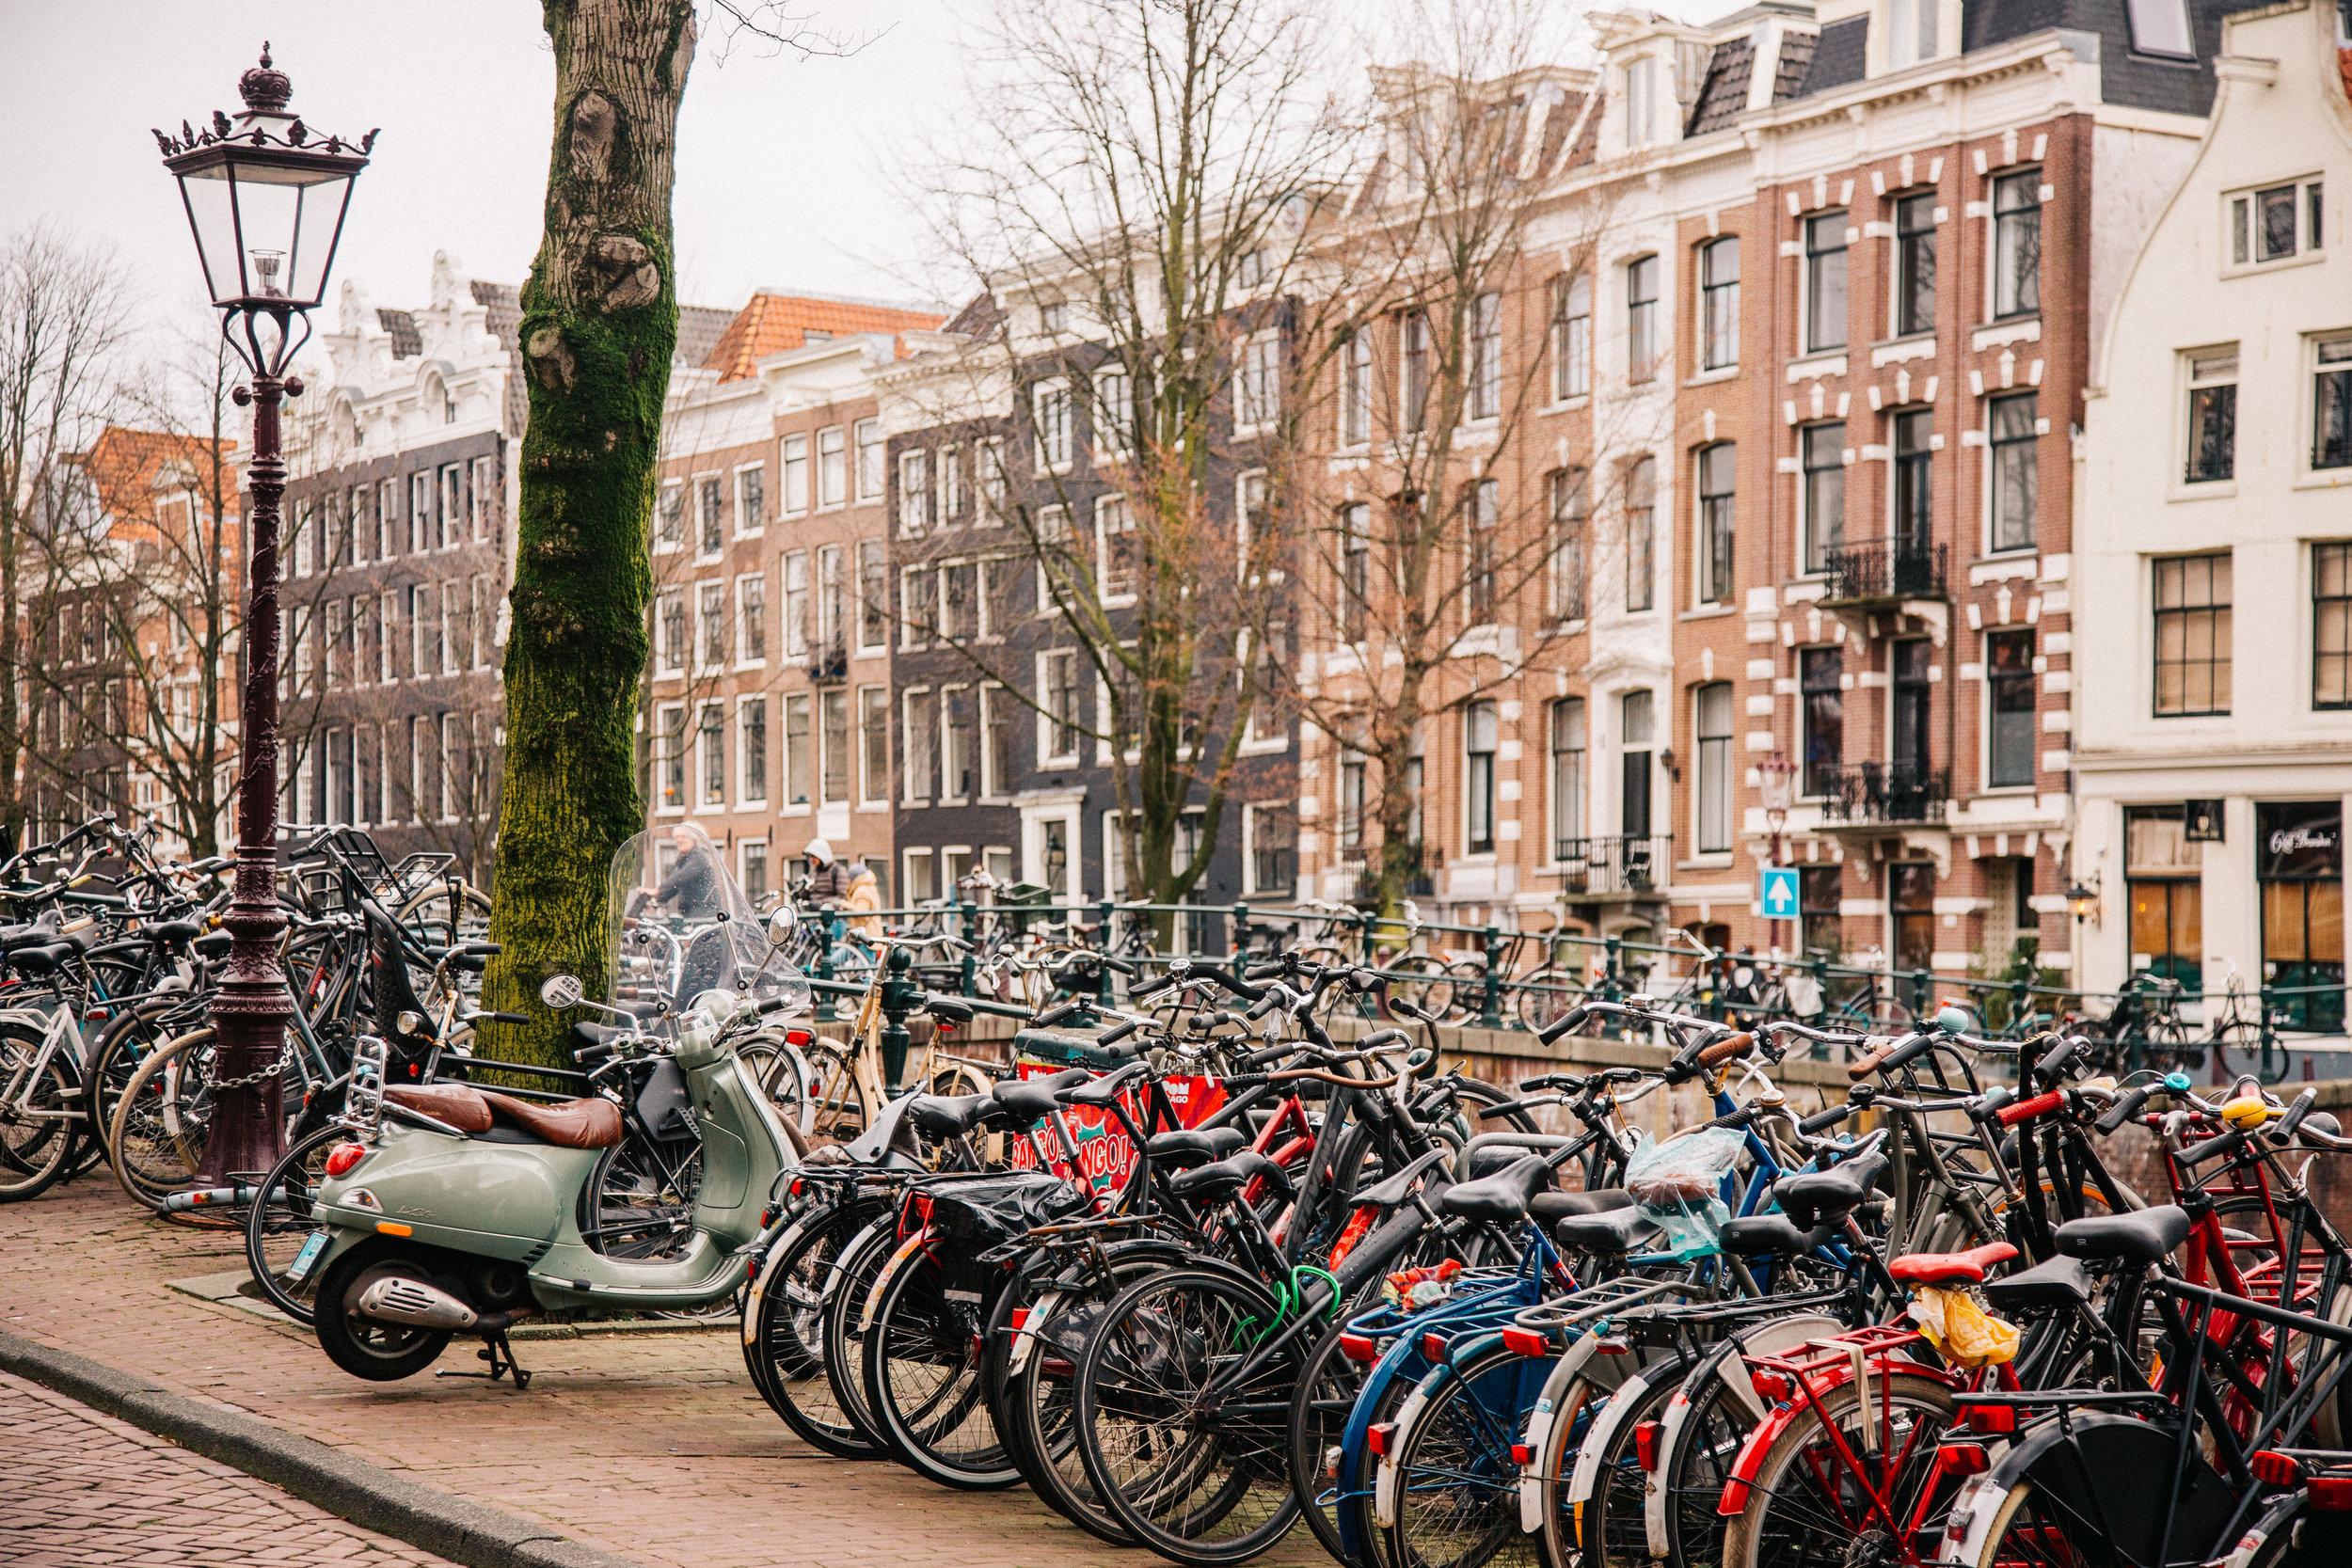 amsterdam-16.jpg